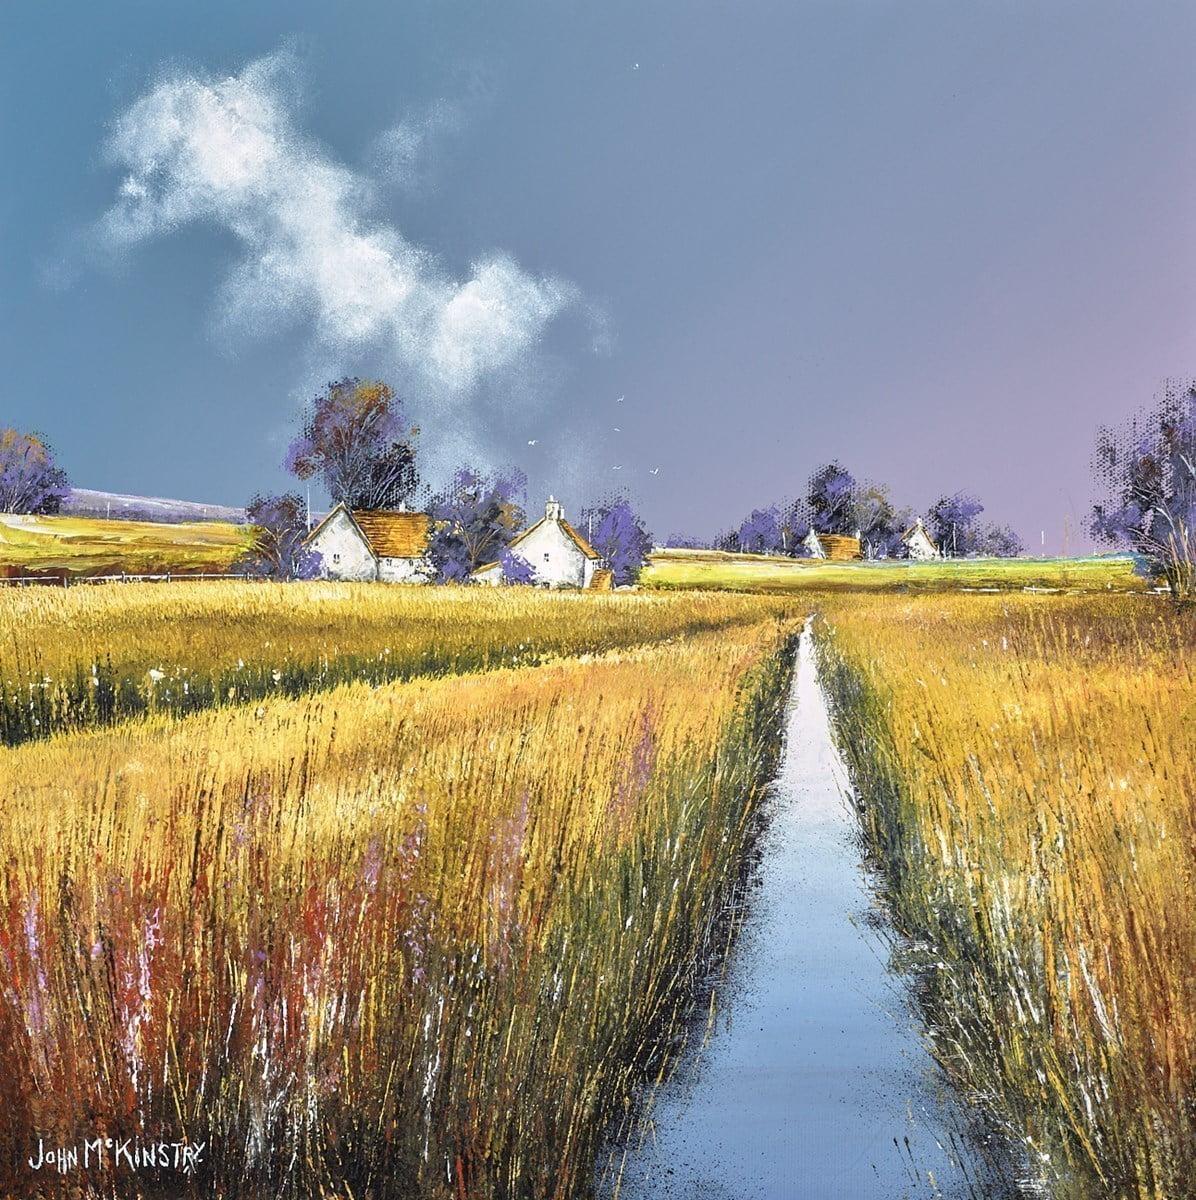 Homelands ~ John Mckinstry